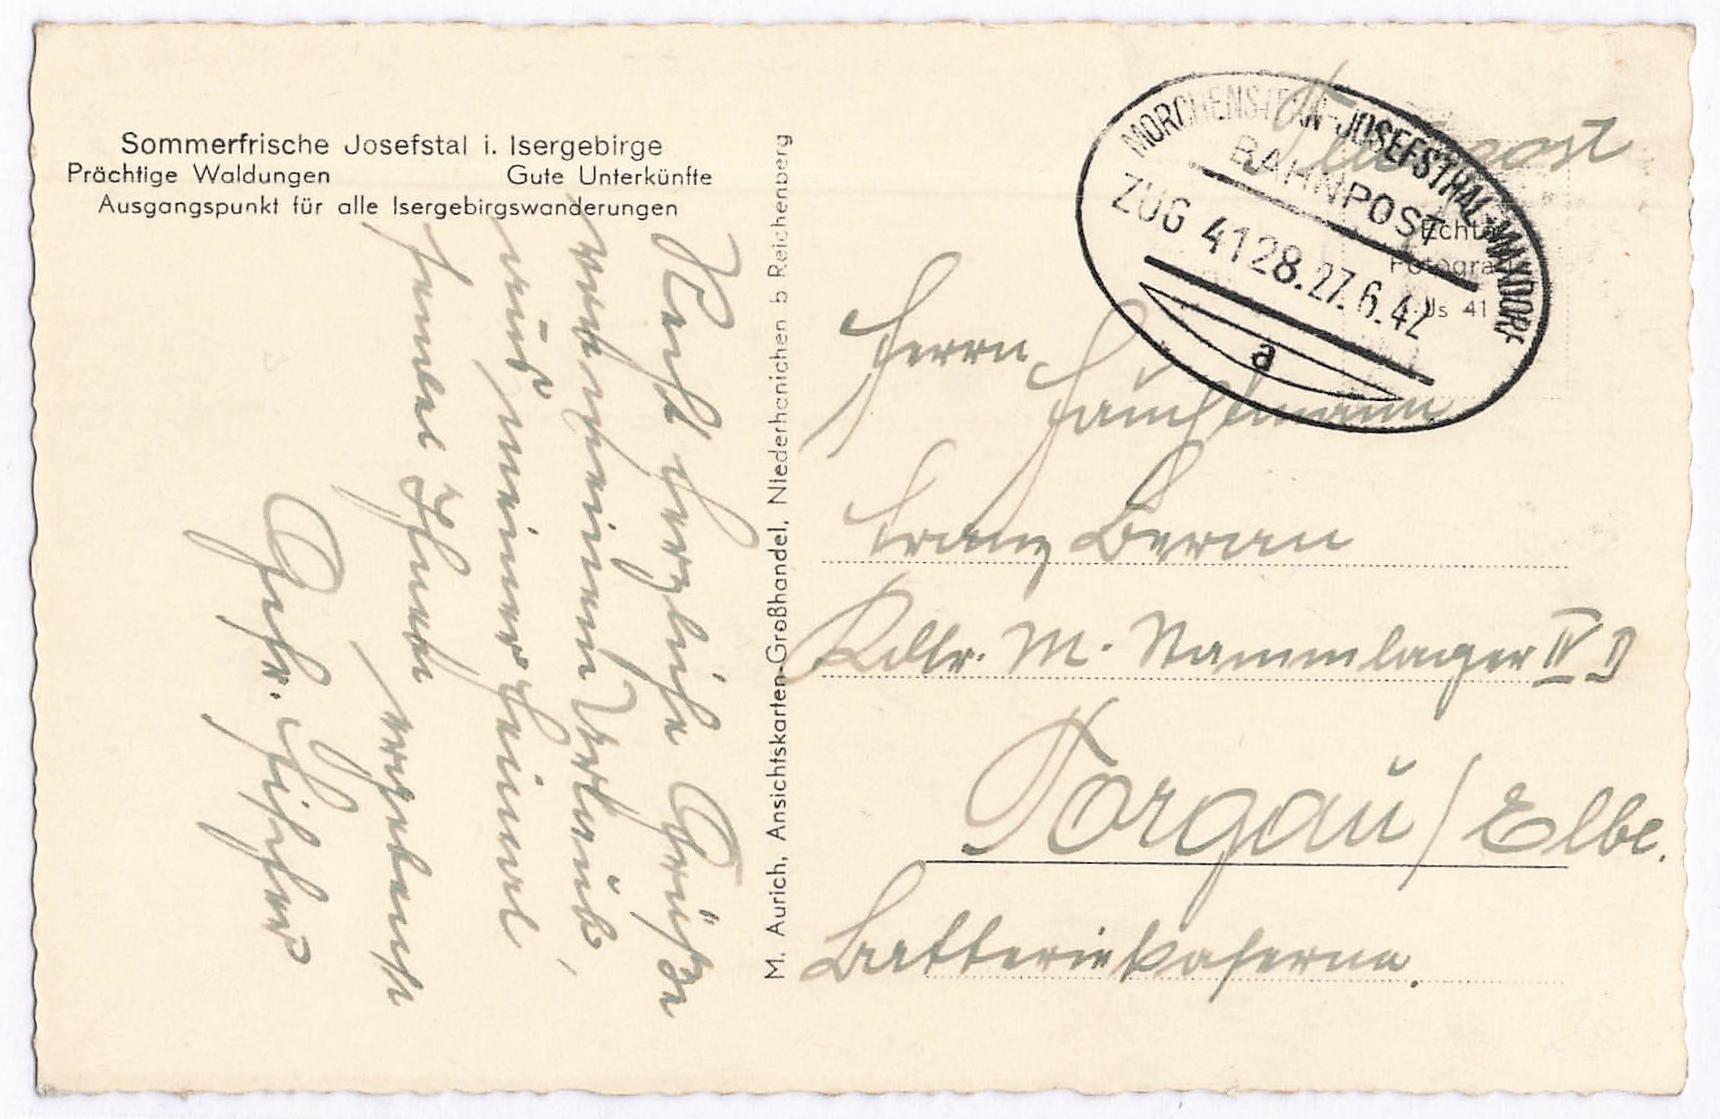 Lot 2589 - Main catalogue sudetenland -  Peter Harlos Auctions 42. Harlos Auktion